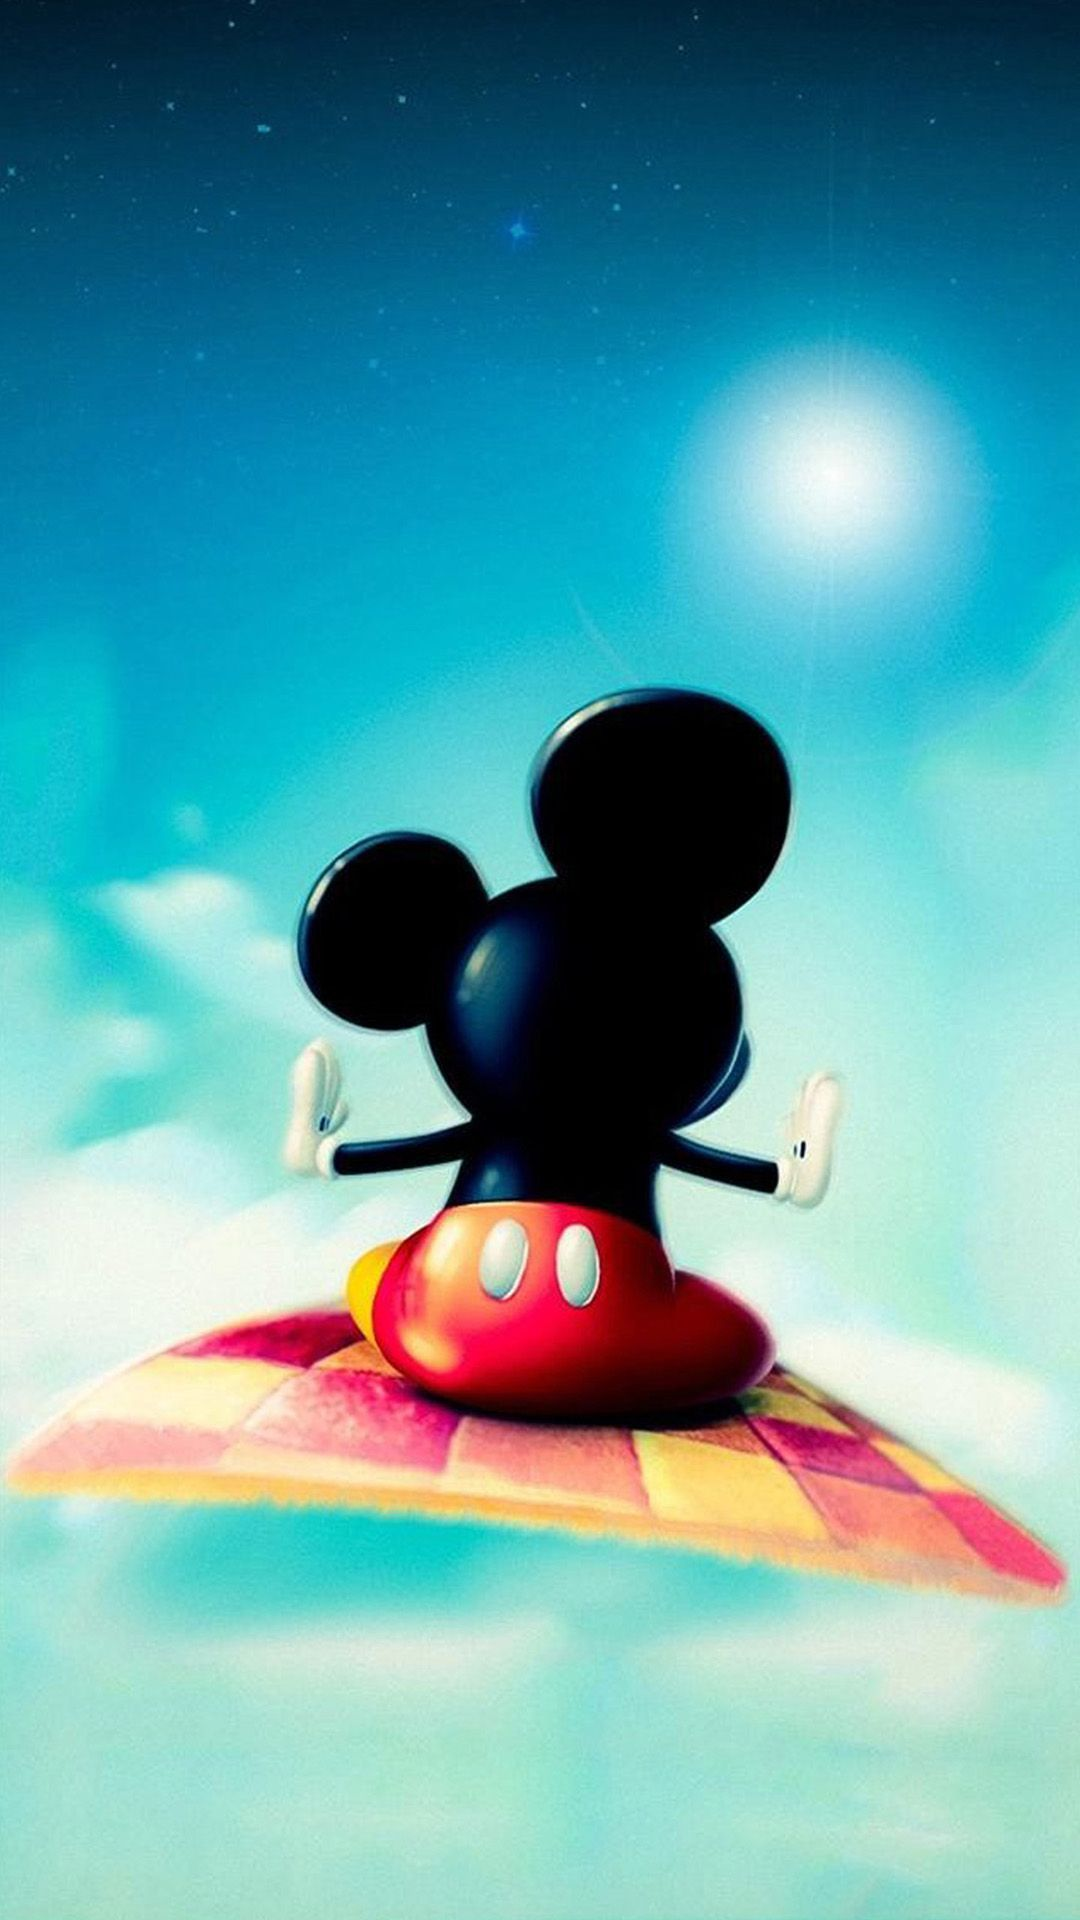 Disney Cartoon Iphone Wallpapers Top Free Disney Cartoon Iphone Backgrounds Wallpaperaccess